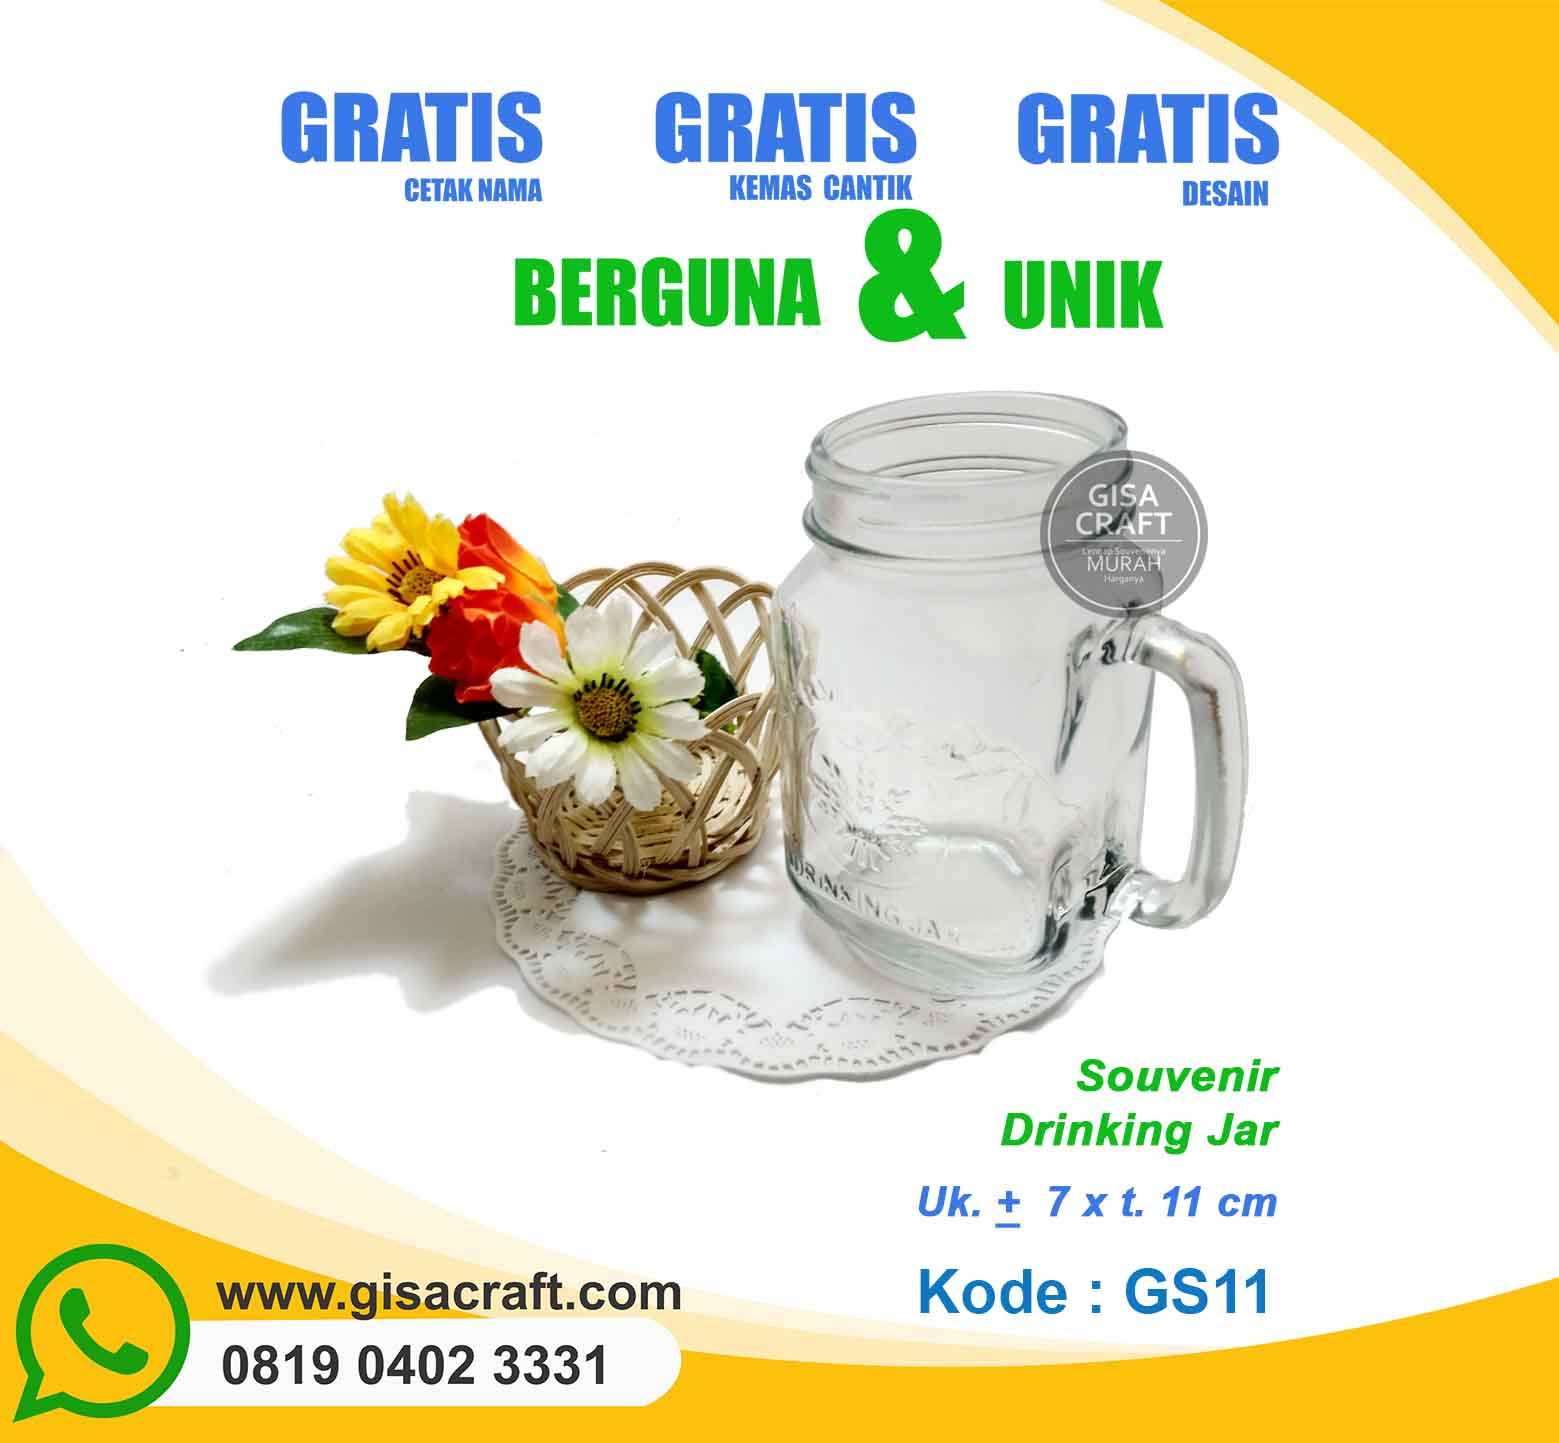 Souvenir Drinking Jar GS11